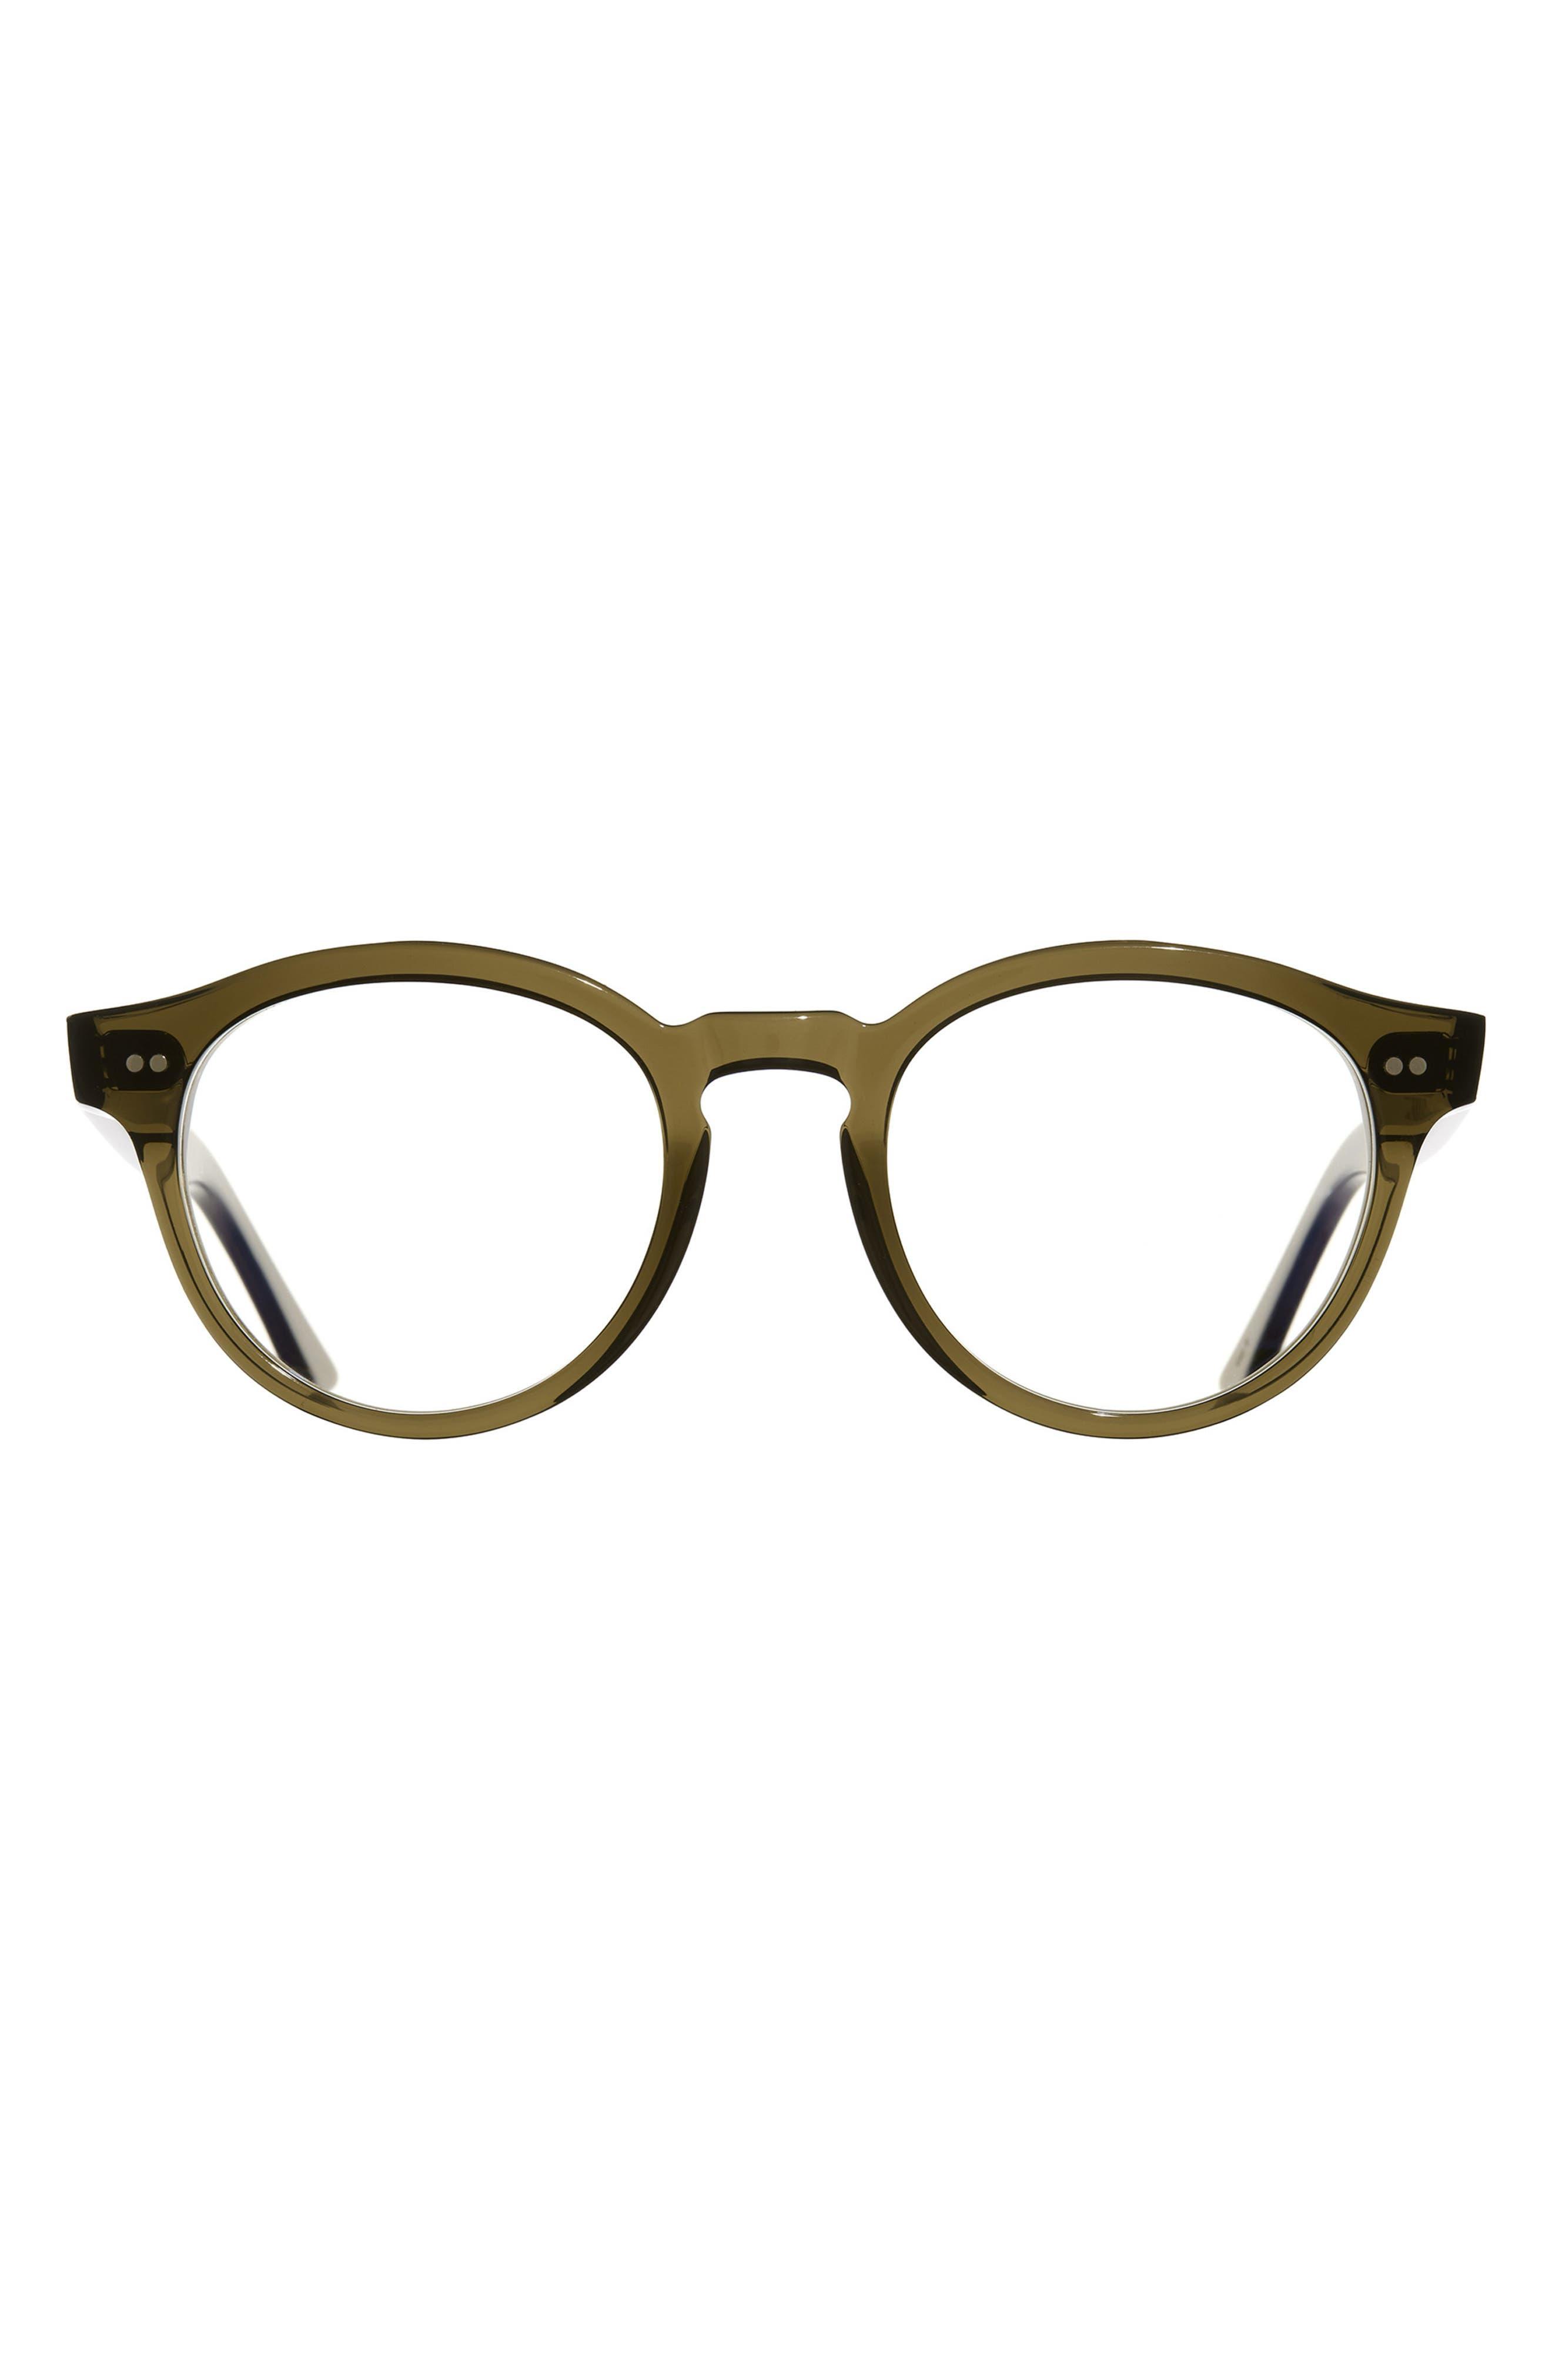 51mm Round Blue Light Blocking Glasses